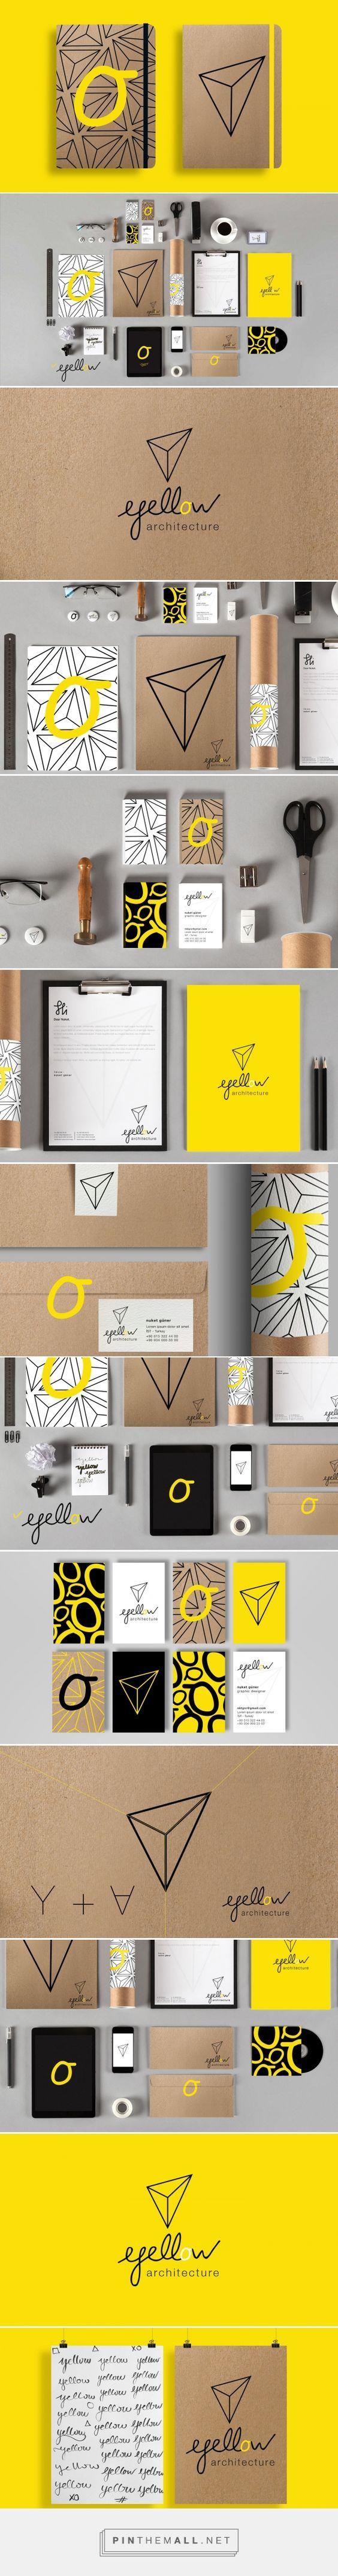 Yellow Architecture Branding by Nuket Guner Corlan | Fivestar Branding – Design and Branding Agency & Inspiration Gallery: